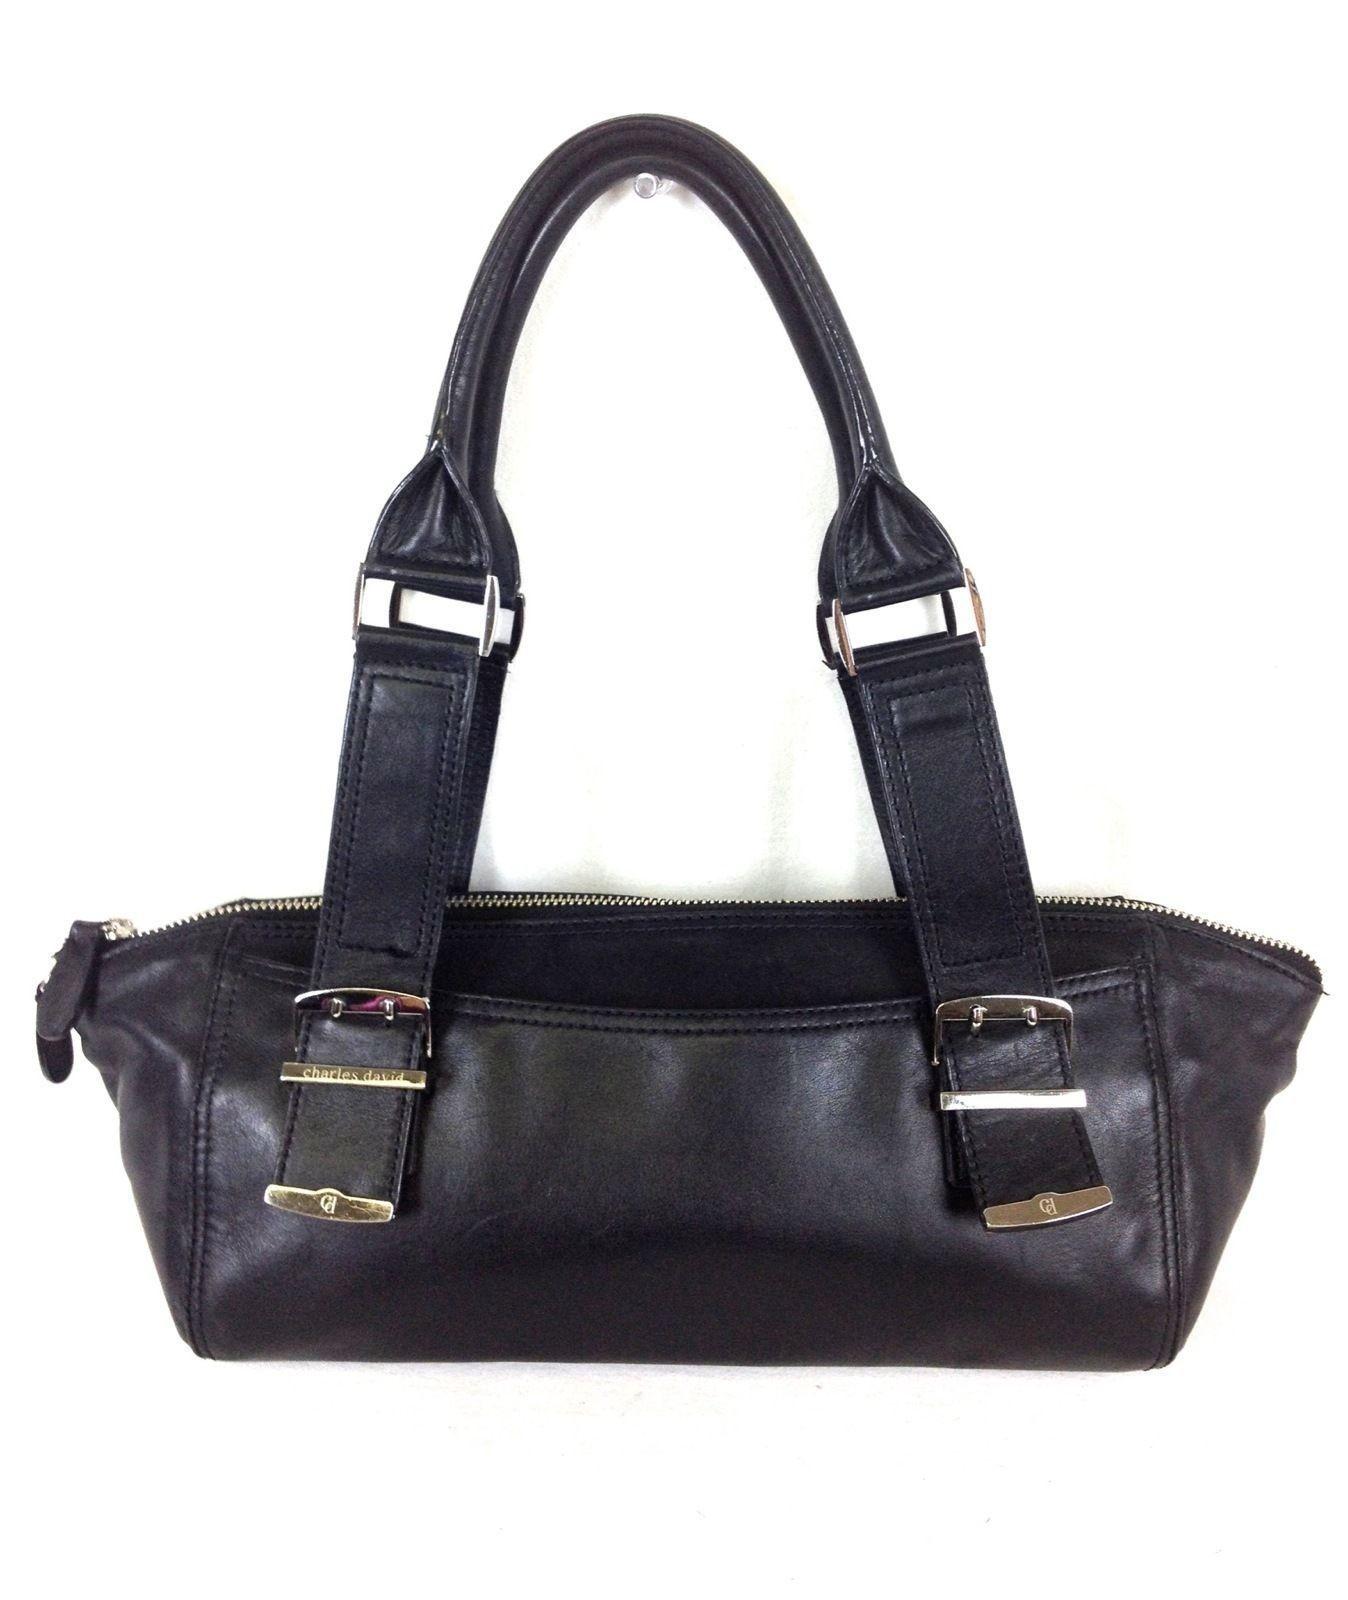 Charles David Purse Leather Black Satchel Top Zip Shoulder Bag Handbag M Handbags Purses